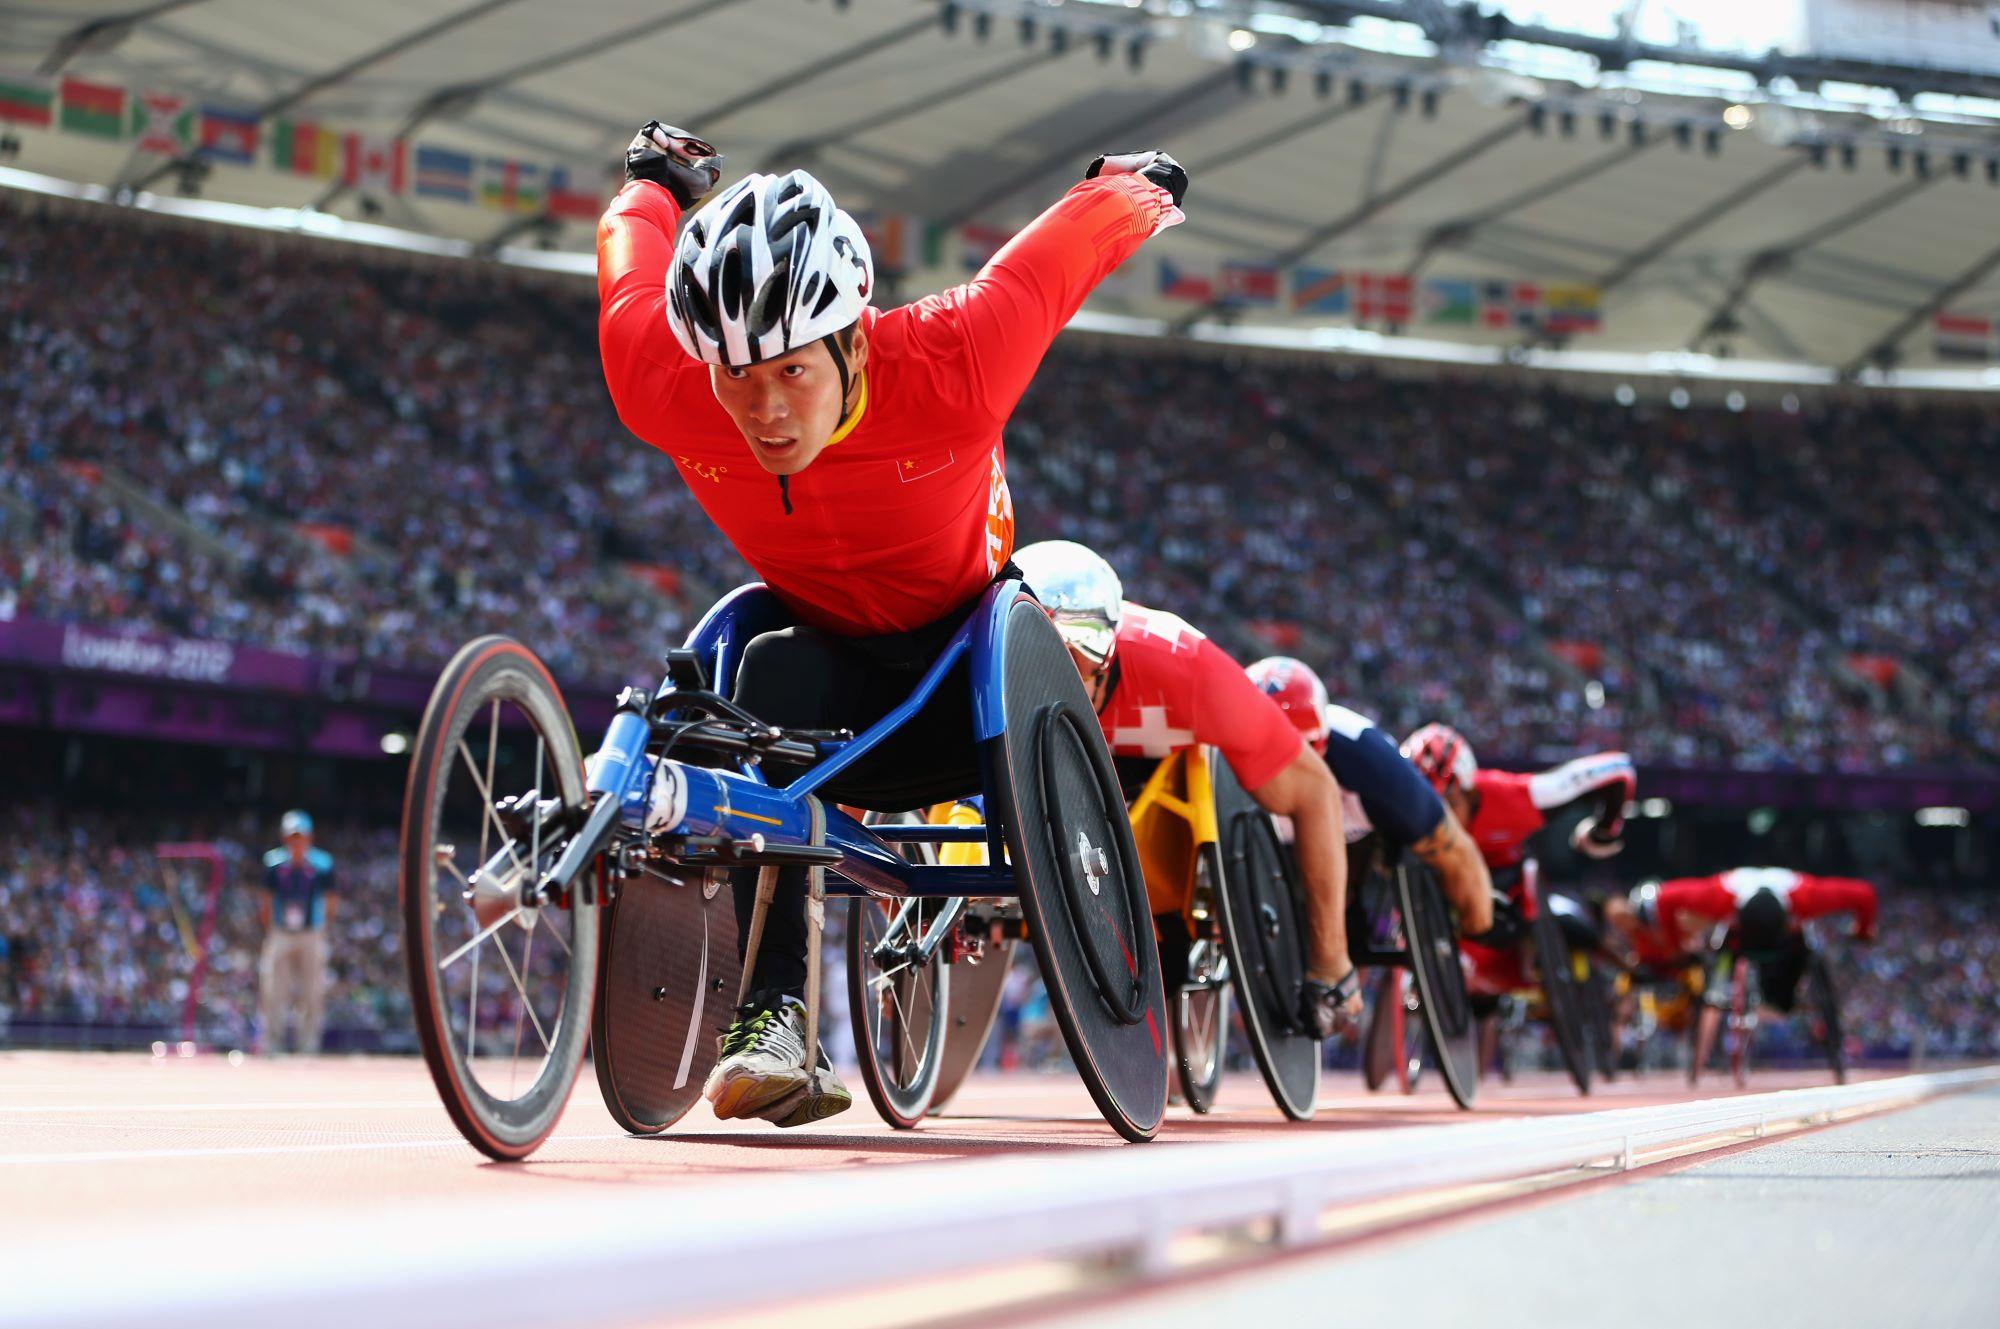 Le para athlète chinois Lixin Zhang en tête de la course fauteuil